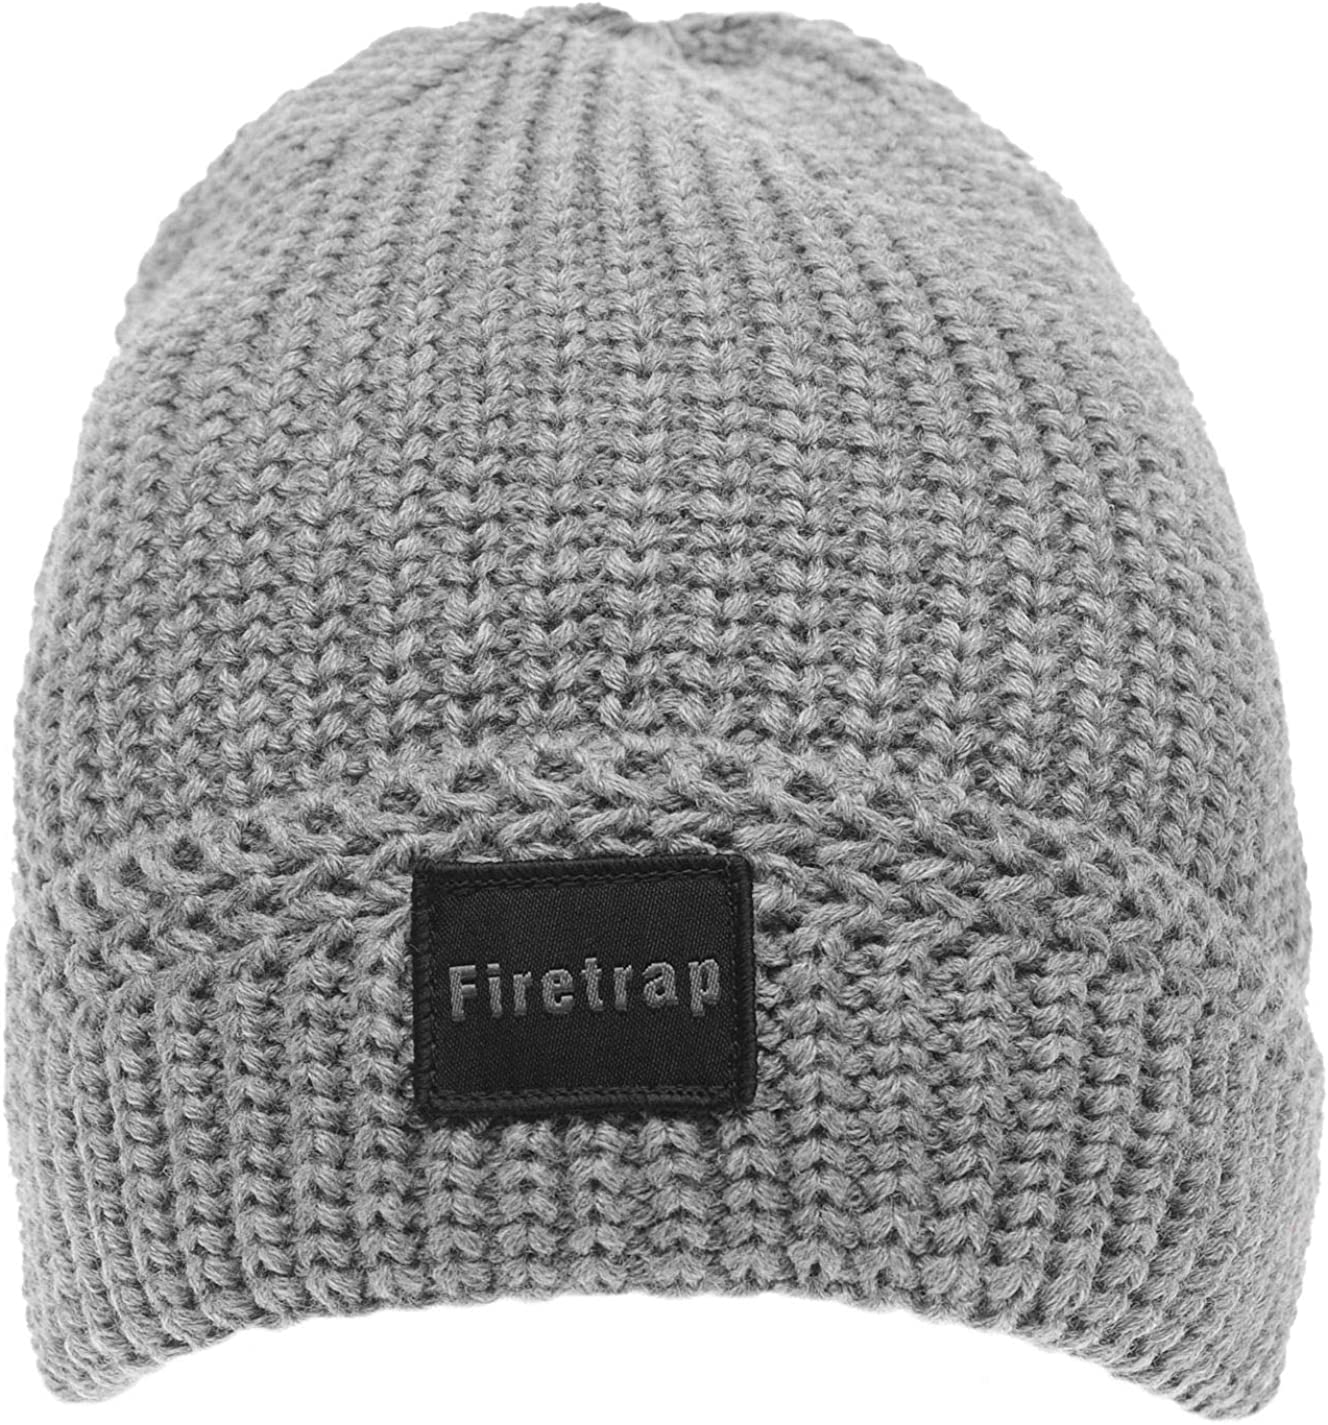 Firetrap Mens Ribbed Beanie Hat Cap Winter Knit Warm Snow